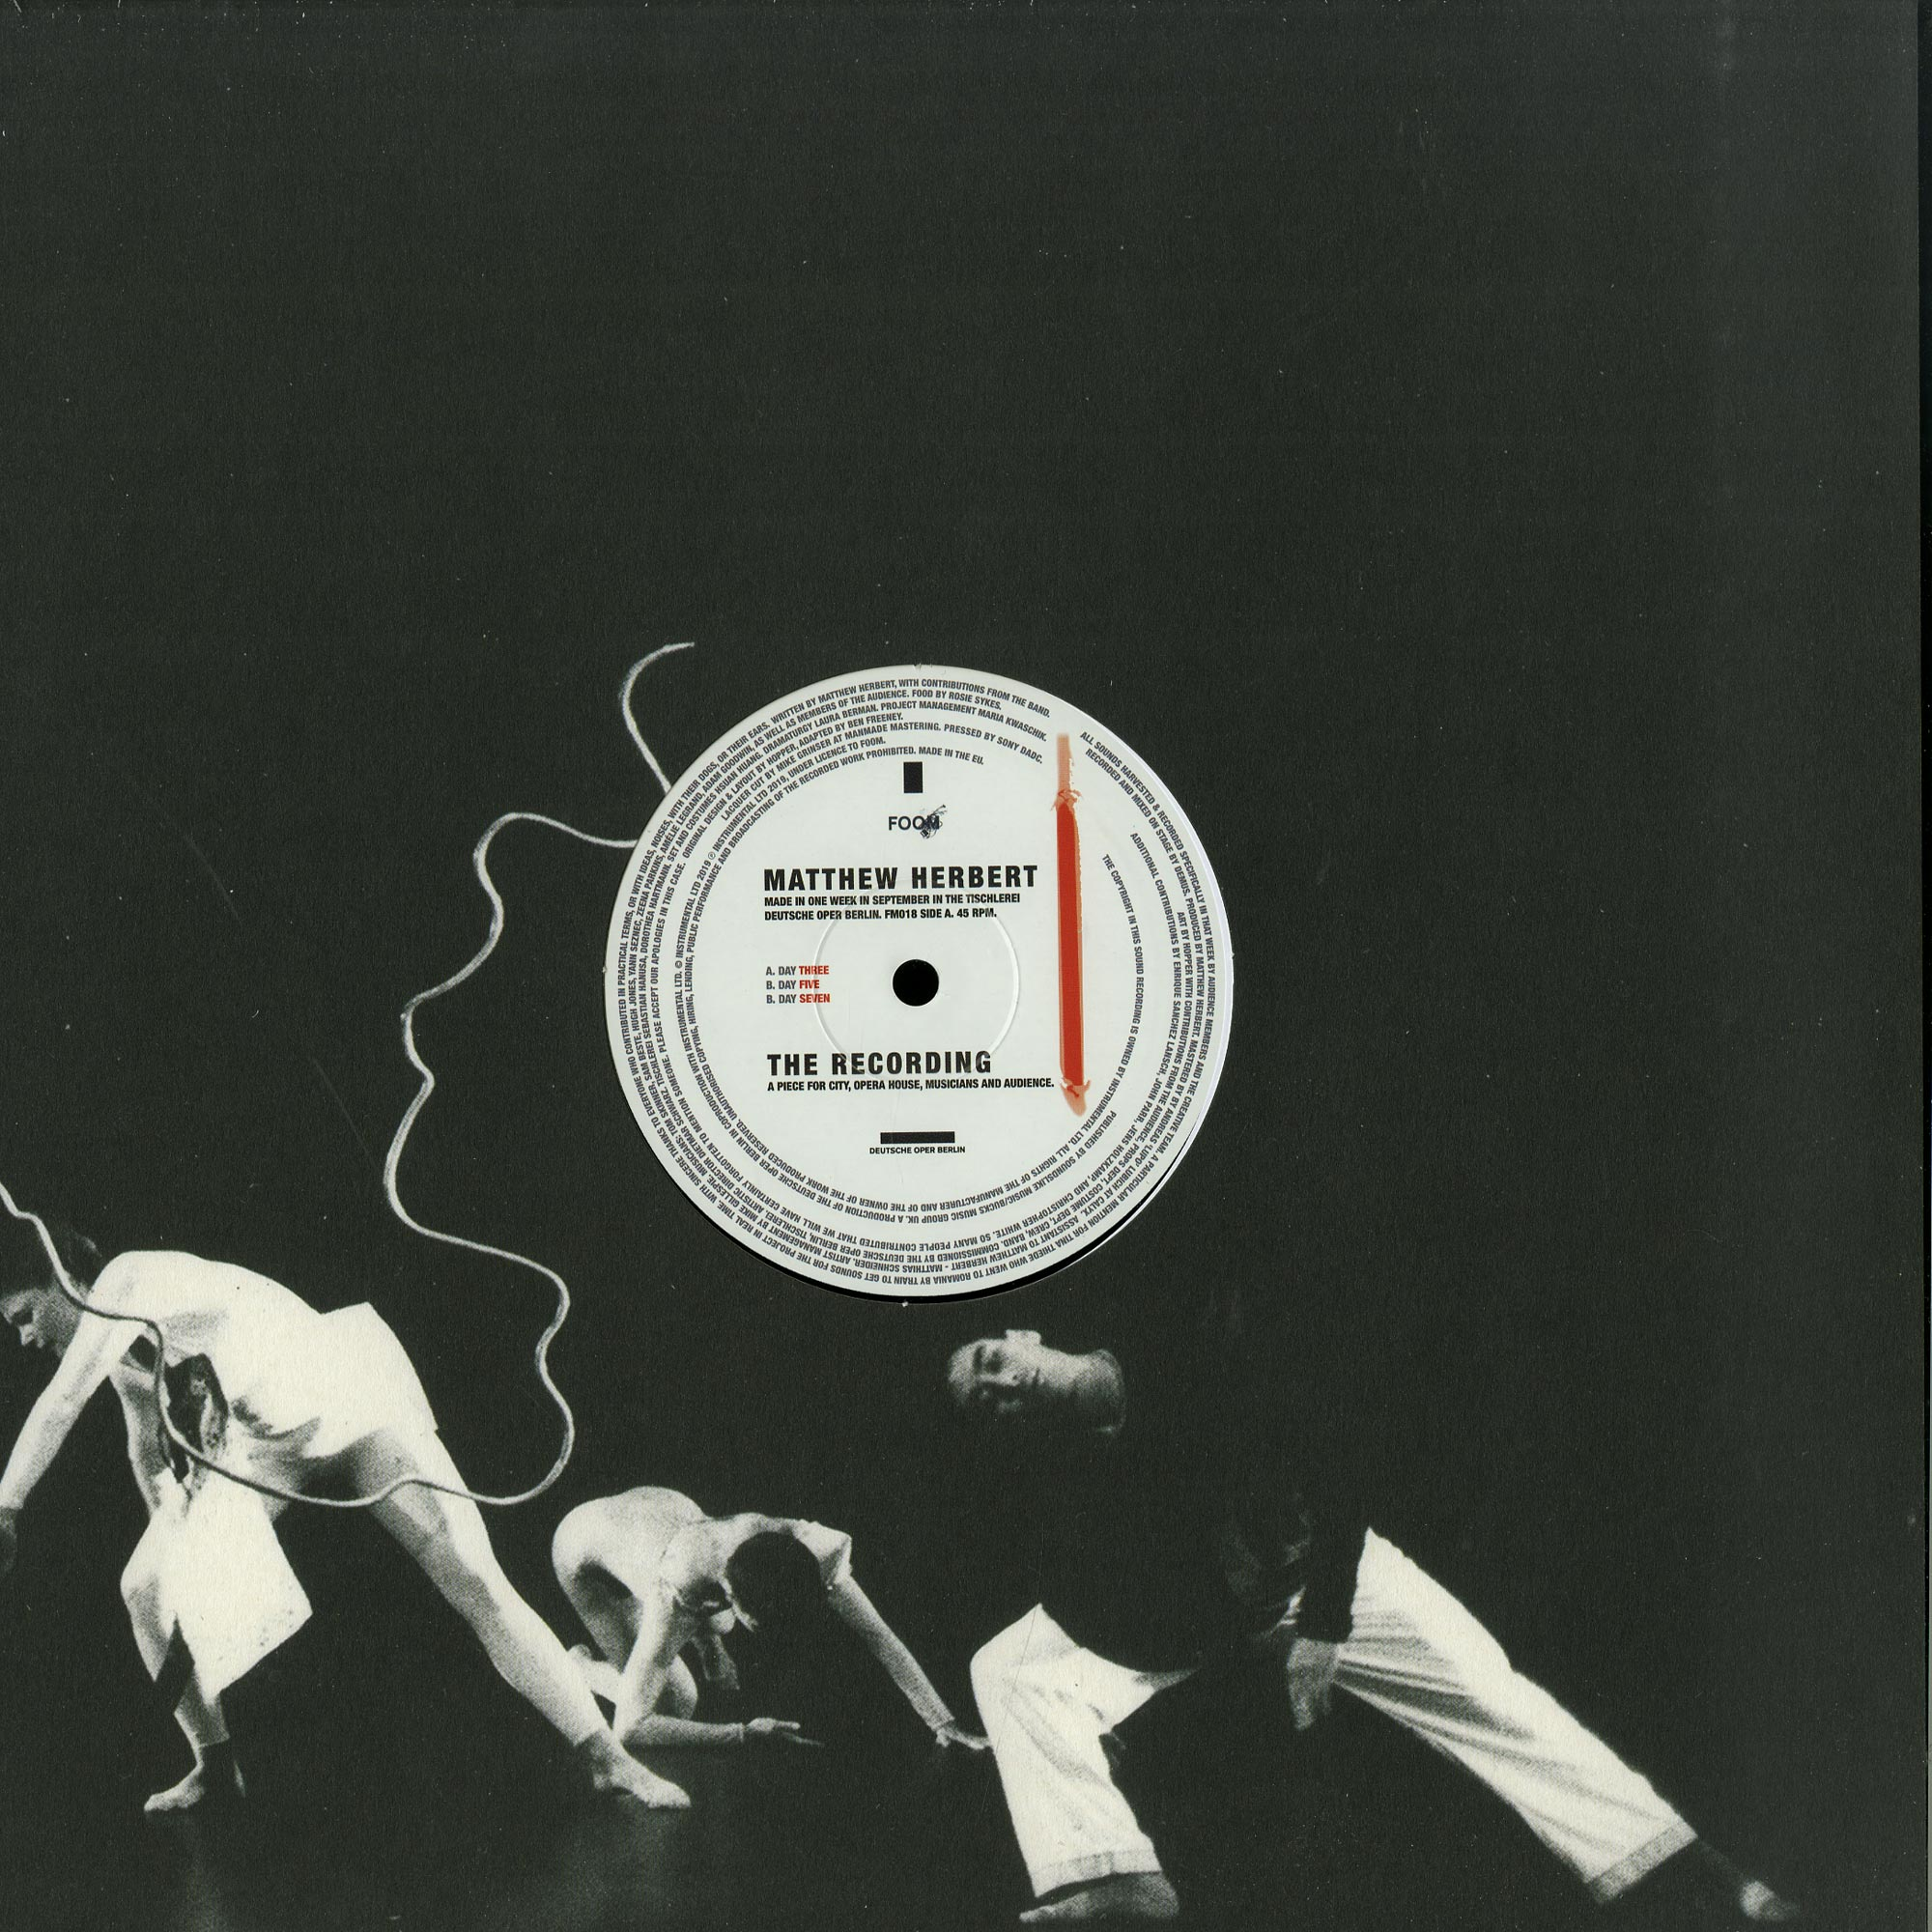 Matthew Herbert - THE RECORDING